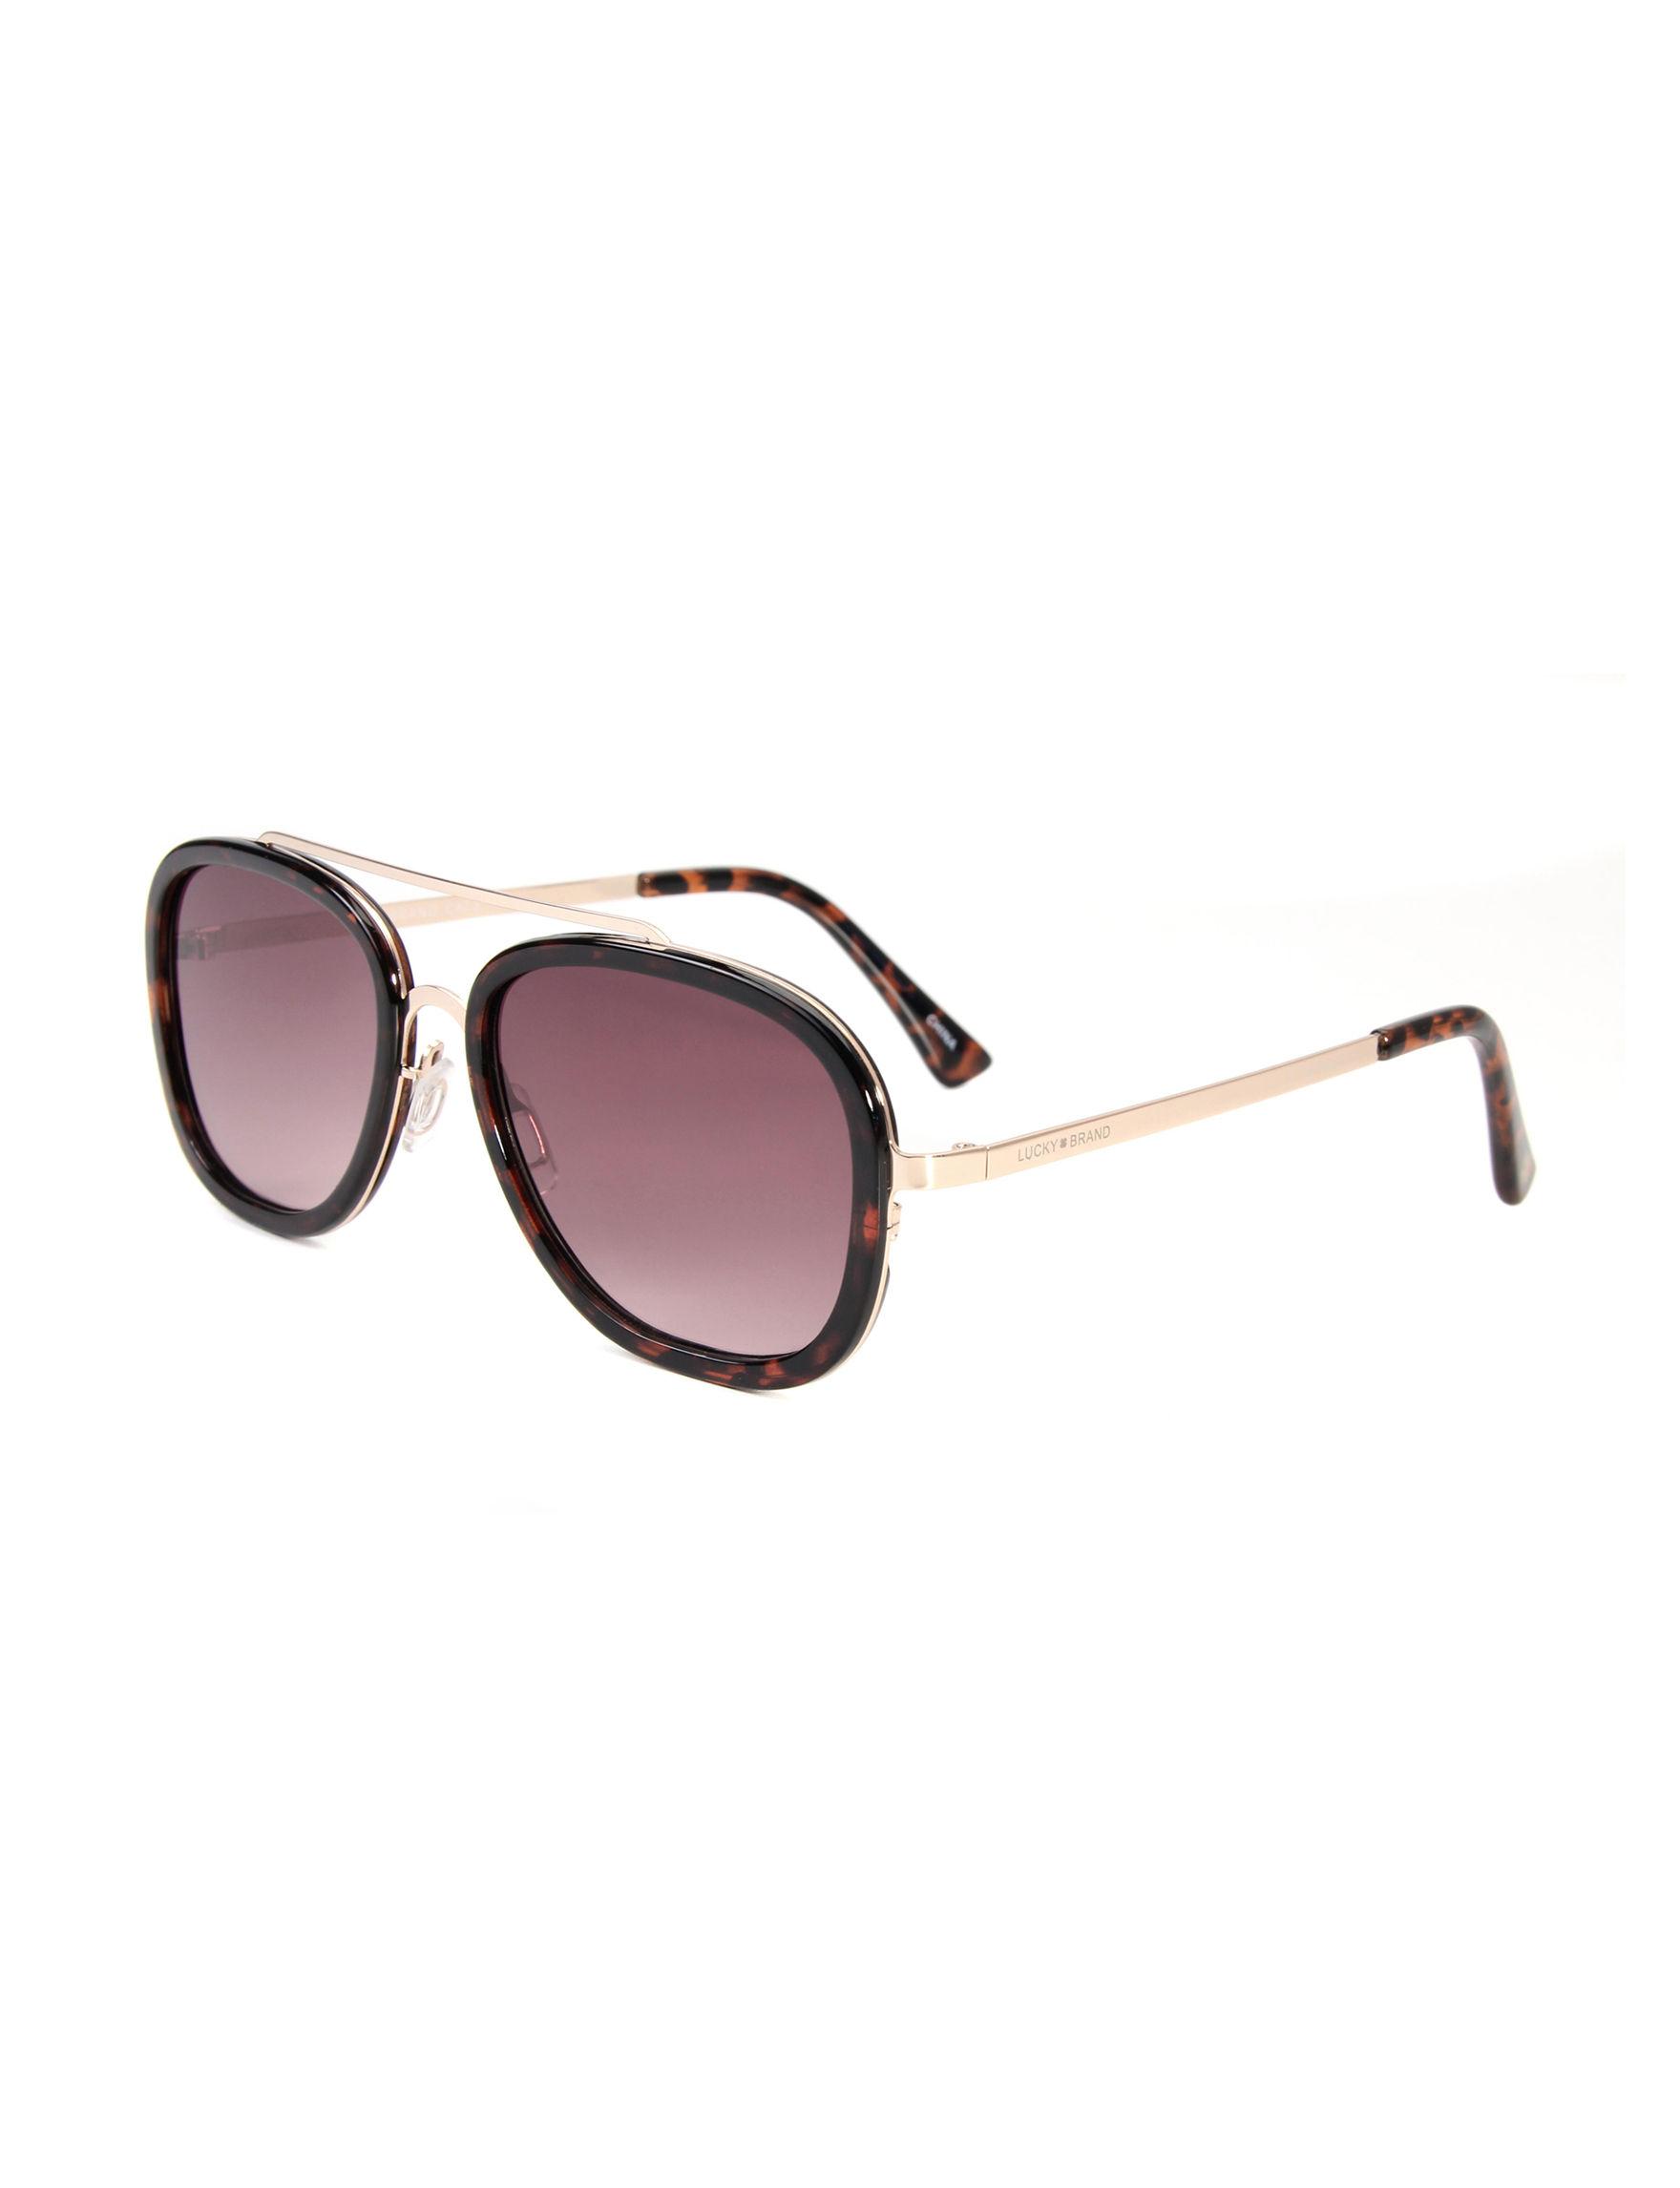 89e74ed1f470c Lucky Brand Faux Tortoise Shell Navigator Aviator Sunglasses